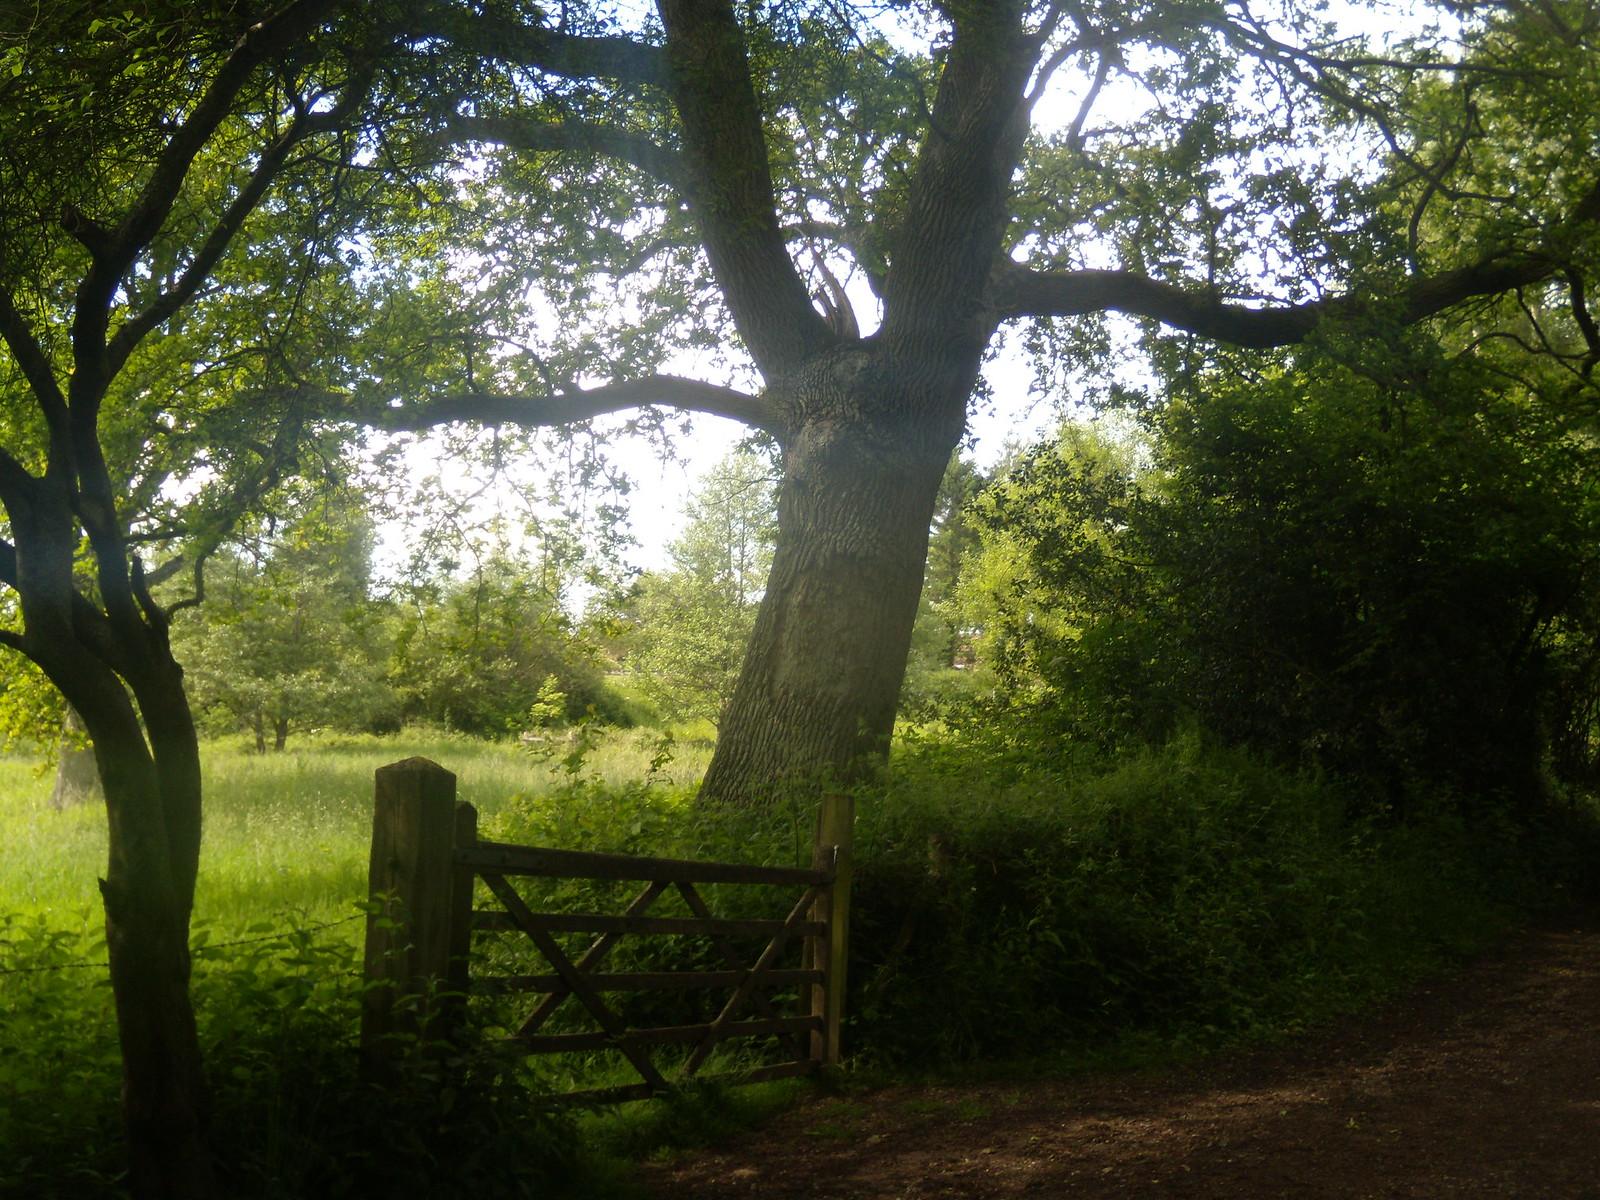 Gate and tree Ashurst Circular